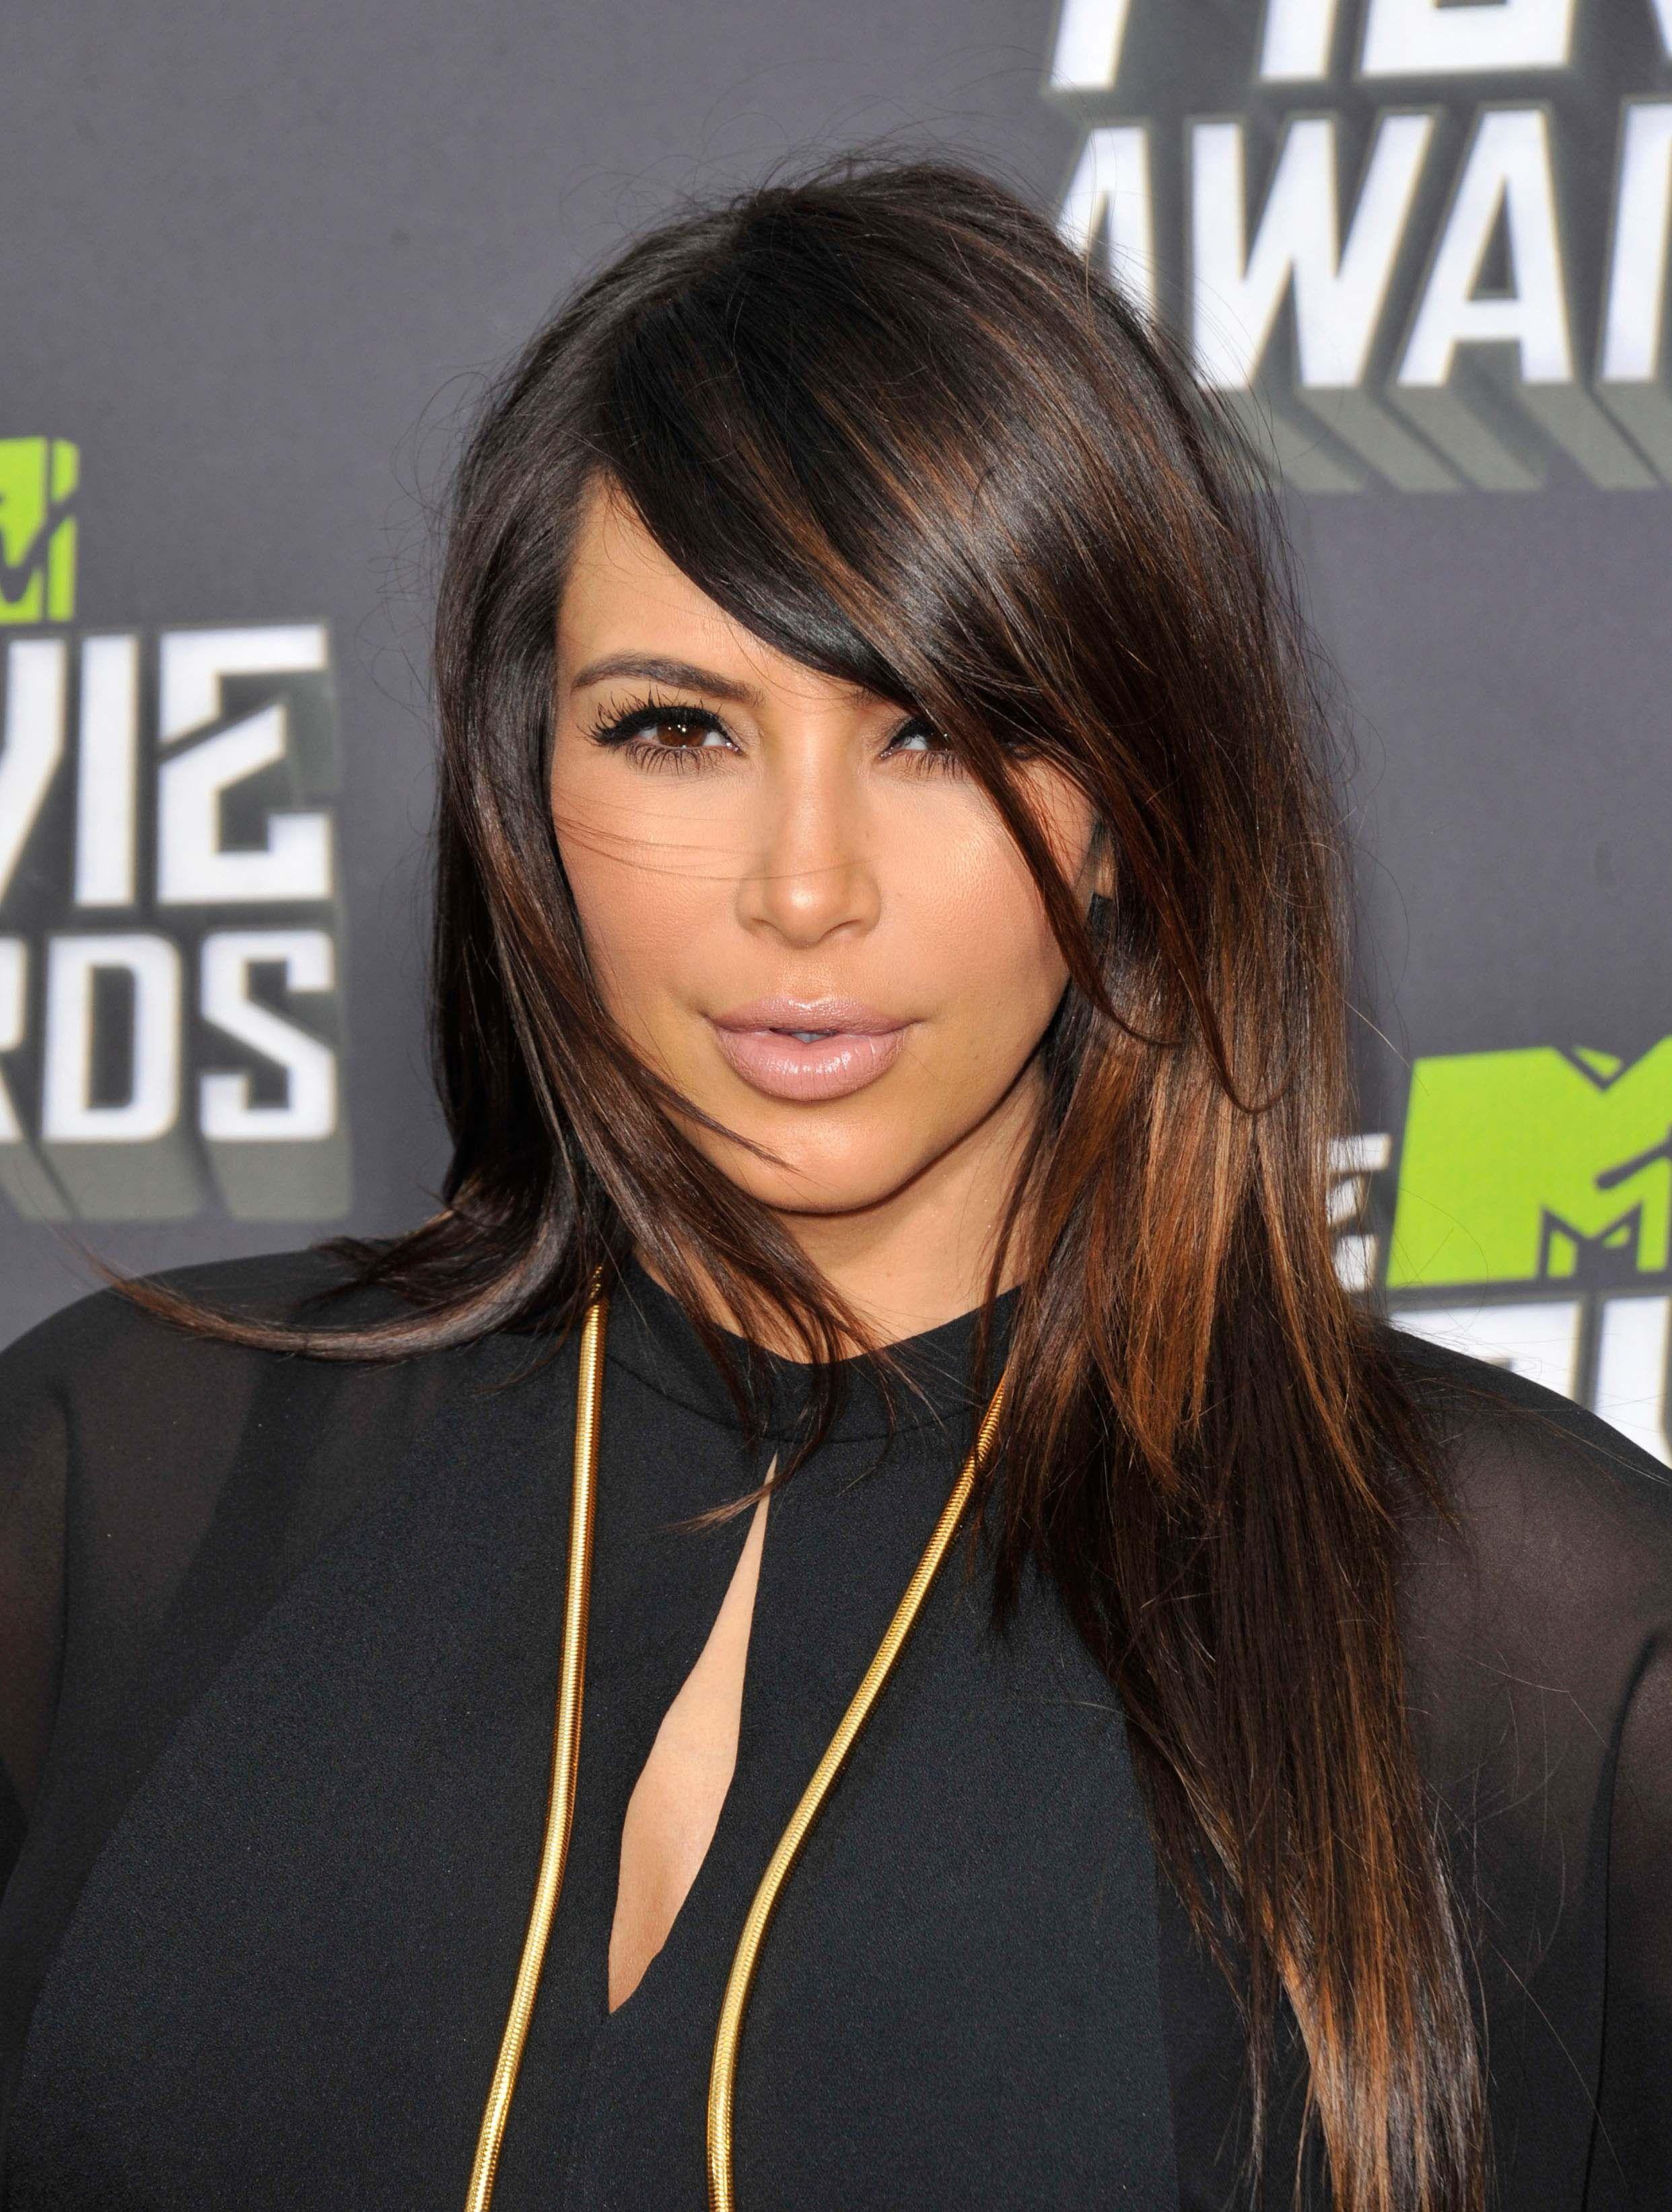 Kim Kardashian Love The Hair Color Long Hair Styles Hair Styles Side Part Hairstyles